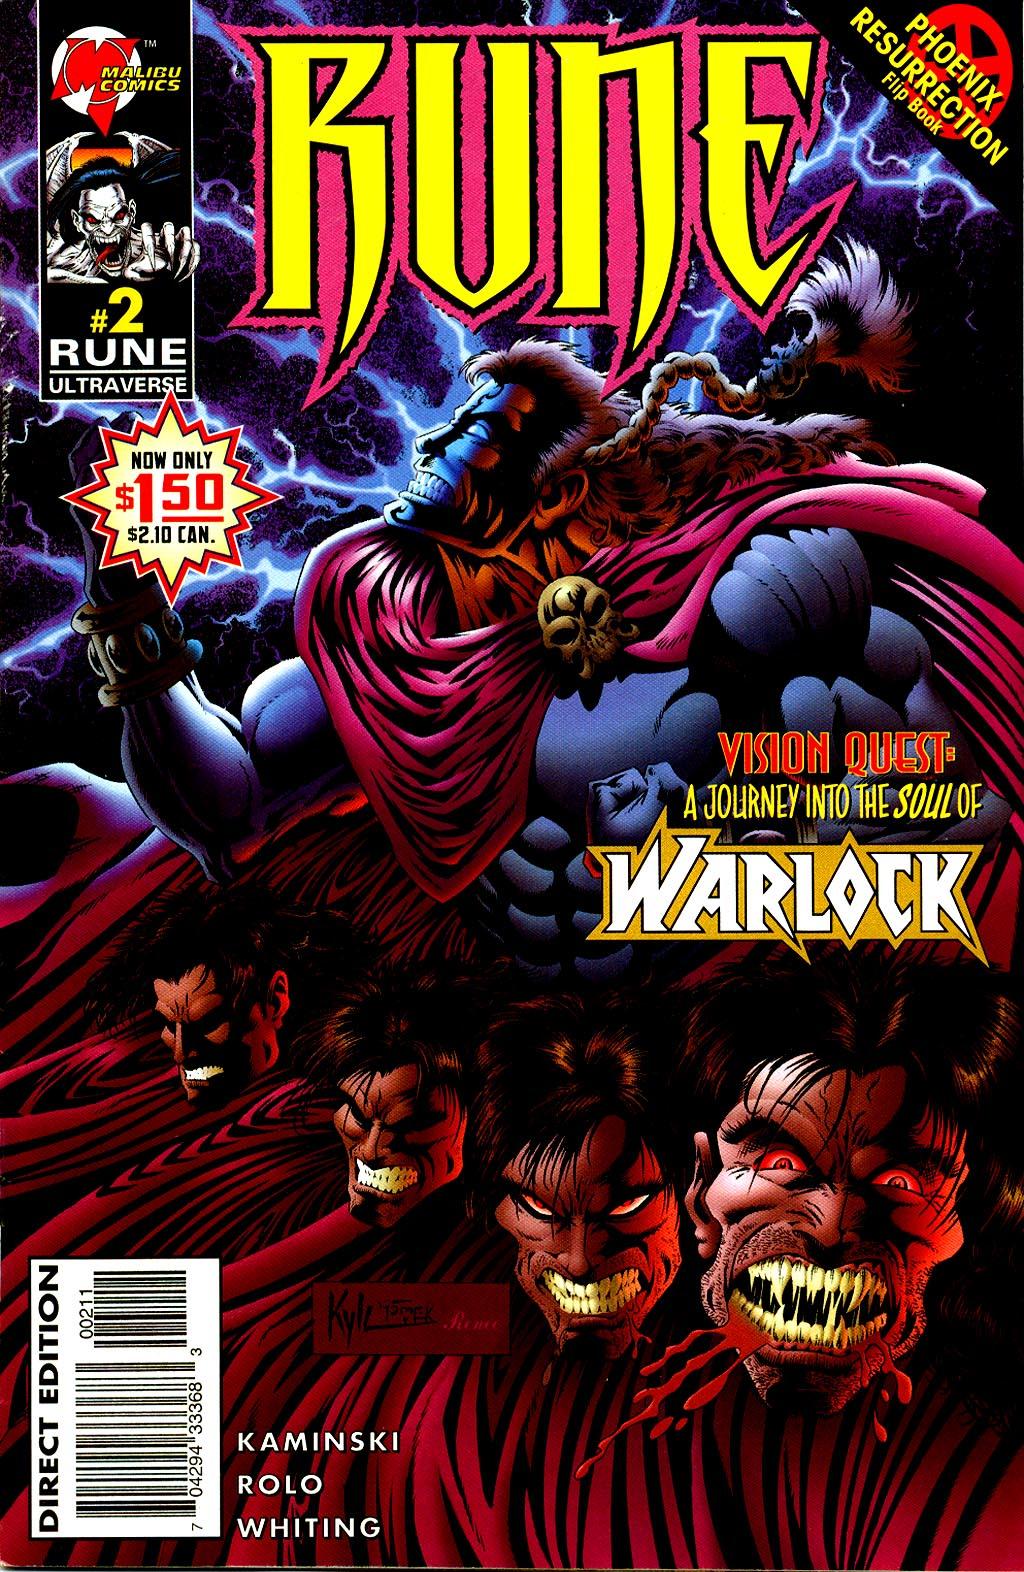 Read online Rune (1995) comic -  Issue #2 - 1